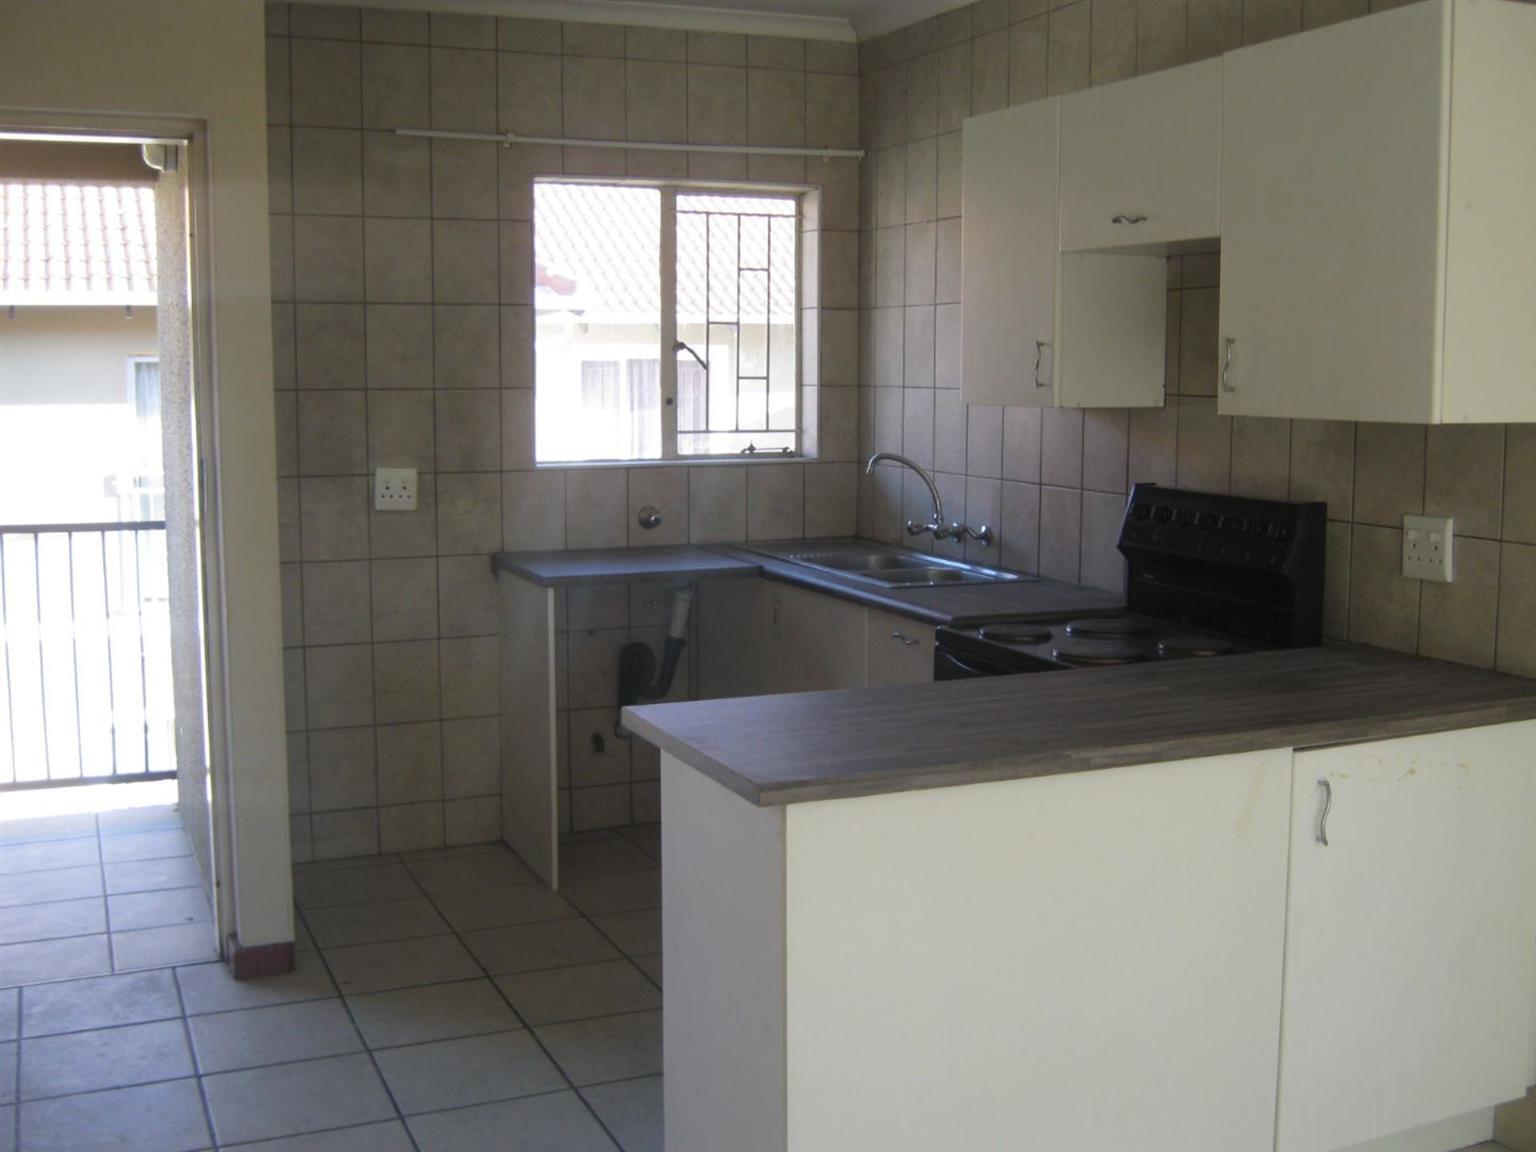 Townhouse Rental Monthly in COMET